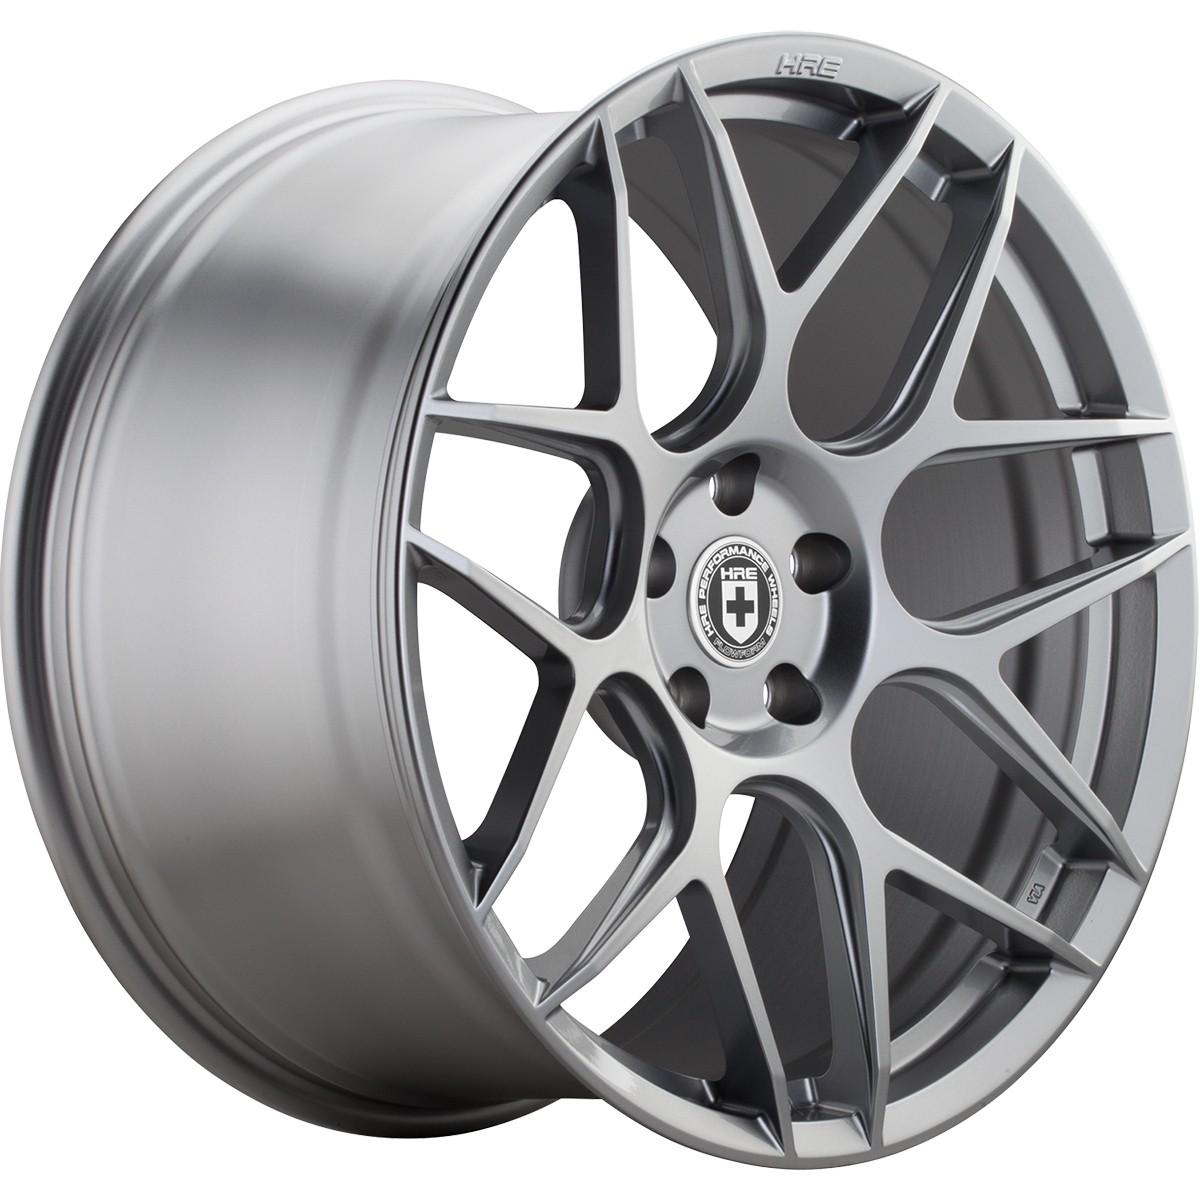 Hre Flowform Ff01 Wheels For Mkvi Volkswagen Golf Gti Hre Ff01 Vw Mk6 Gti 034motorsport